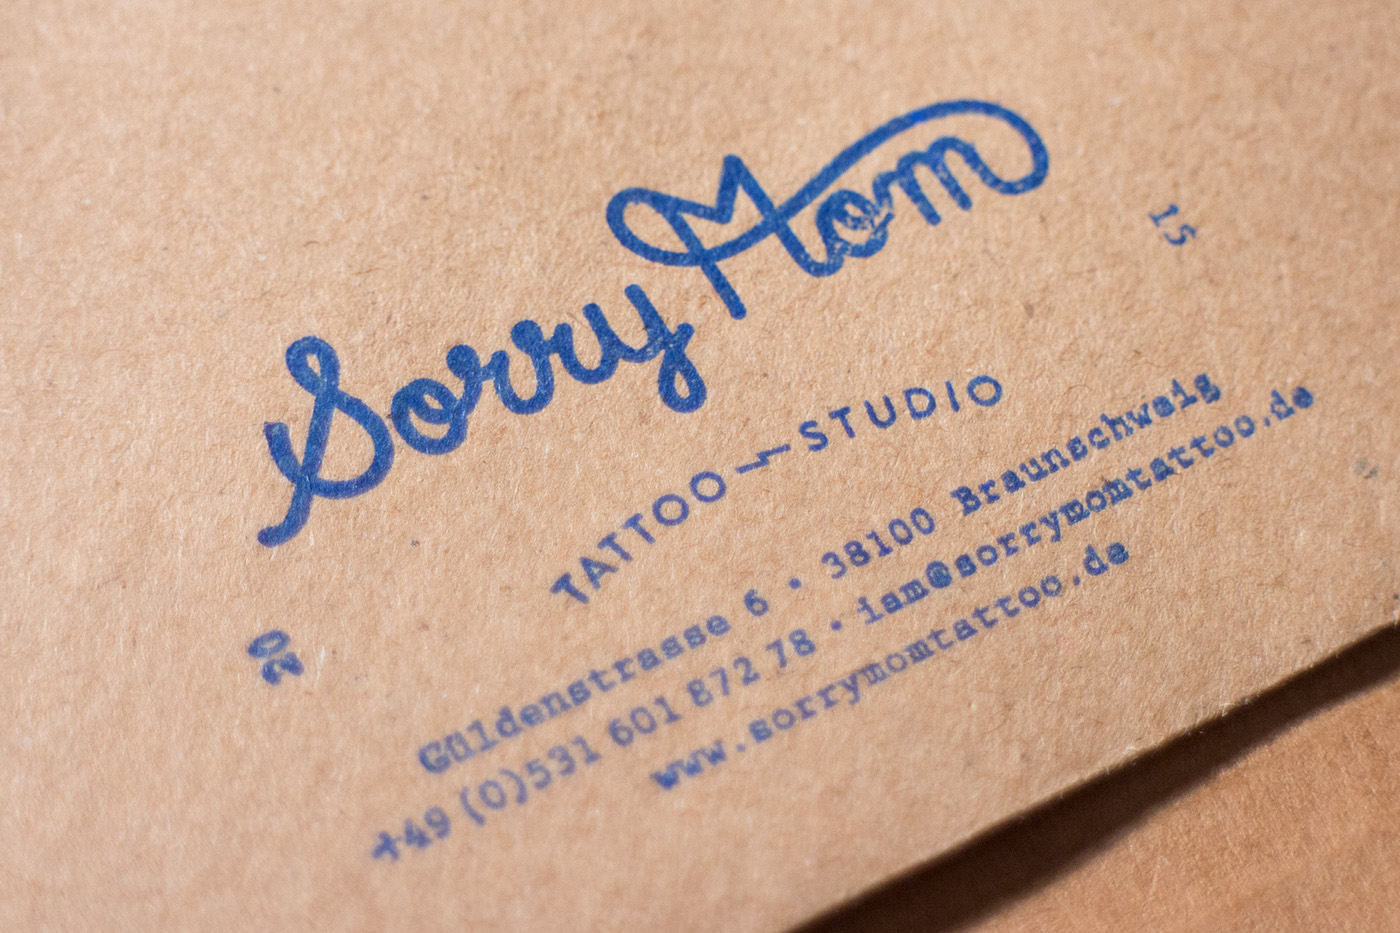 branding  tattoo stationary apparel wearebuerobuero sorrymomtattoo letterpress WABB ILLUSTRATION  Kumamotoplum